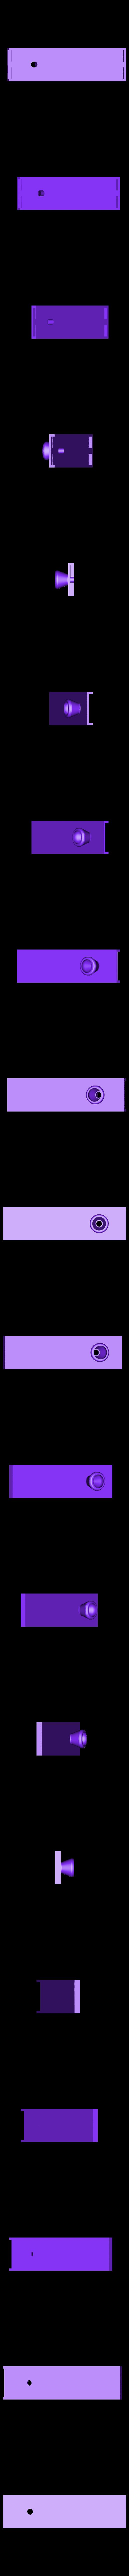 LED_plate_2stripes_locline.stl Download free STL file Dual LED stripe (10*100) plate with Loc-Line support - Dual LED stripe lamp with Loc-Line support • 3D print template, MickeyManu